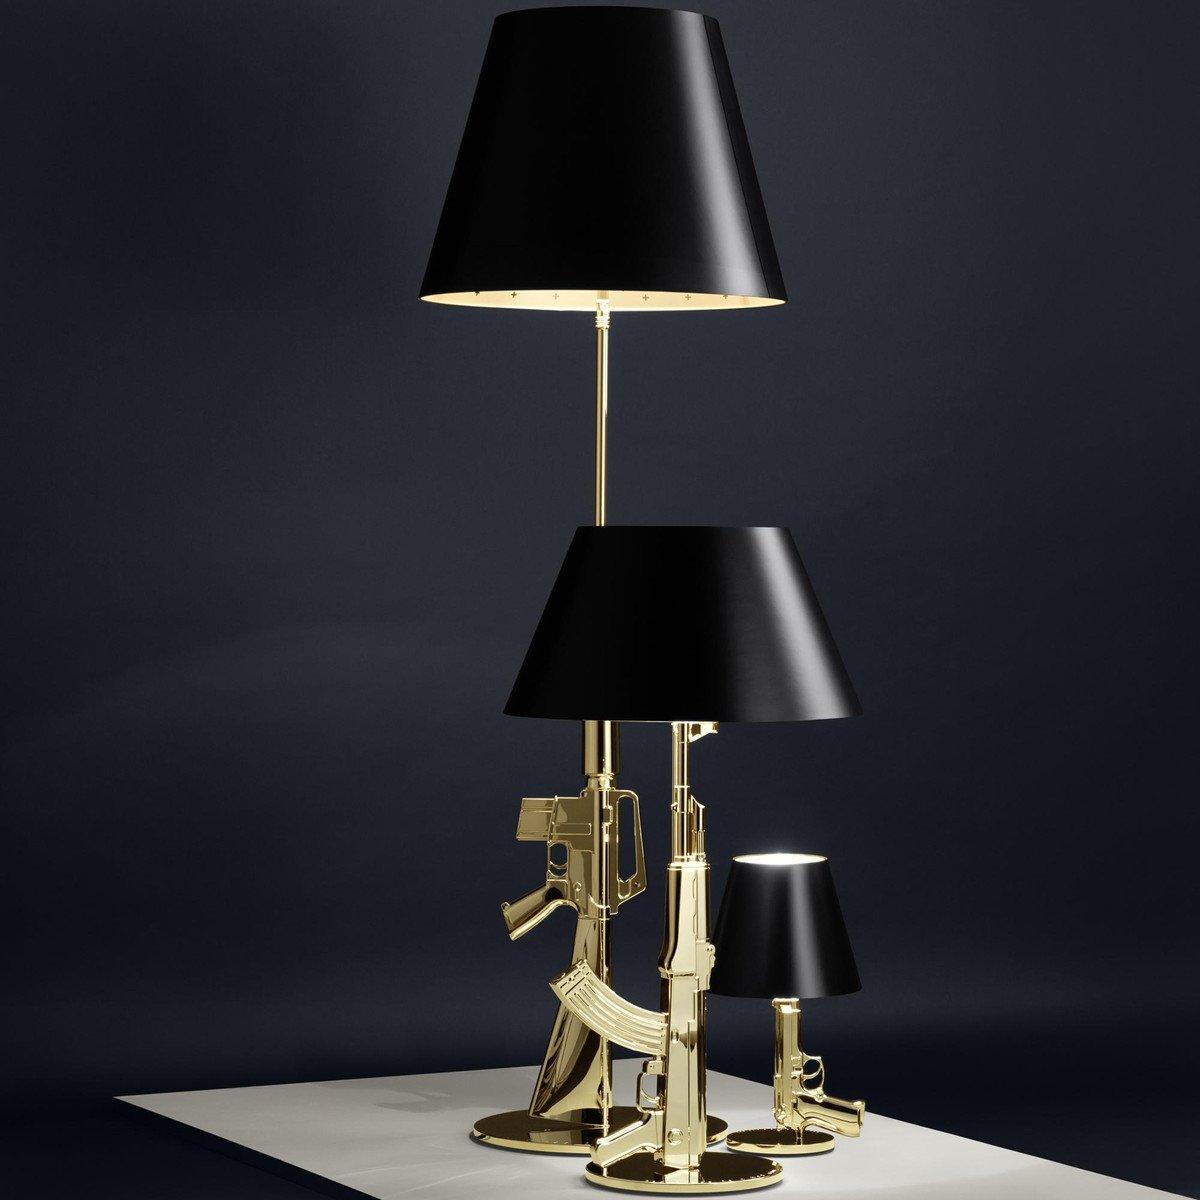 lounge gun lamp lampadaire flos. Black Bedroom Furniture Sets. Home Design Ideas